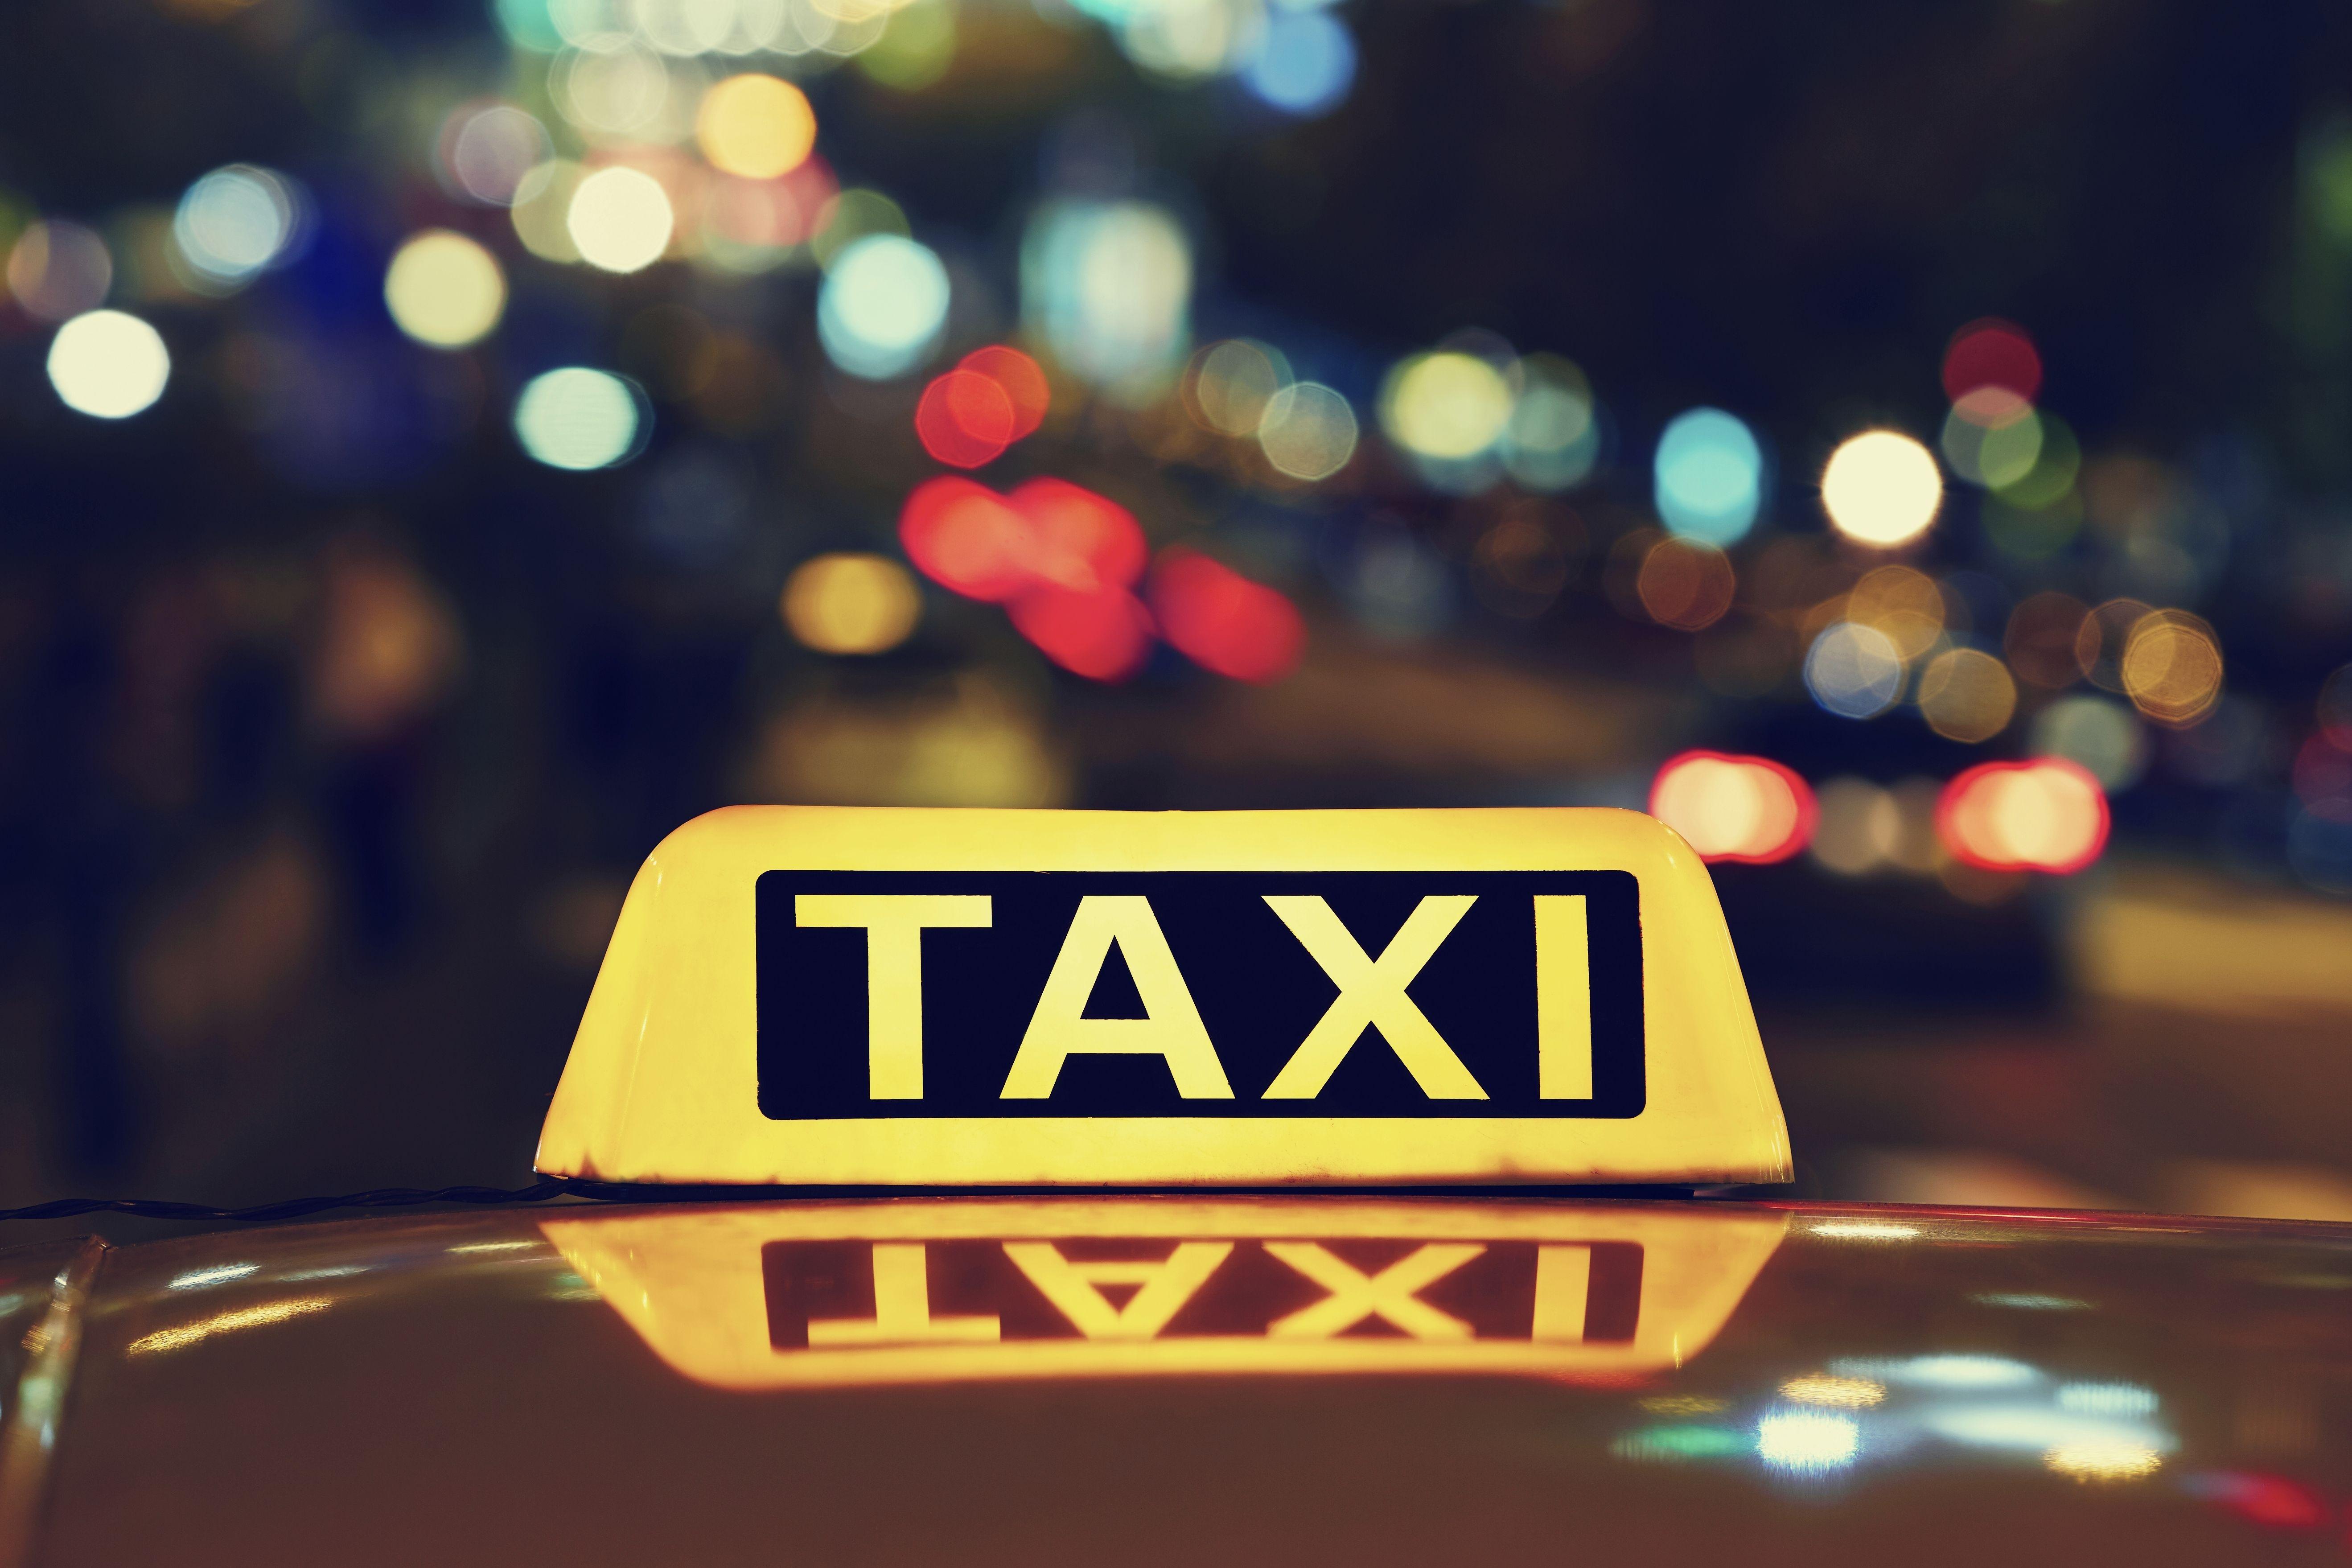 Bodas y despedidas de soltero/a: Servicios de Taxi Jesús María Díaz Mendaza